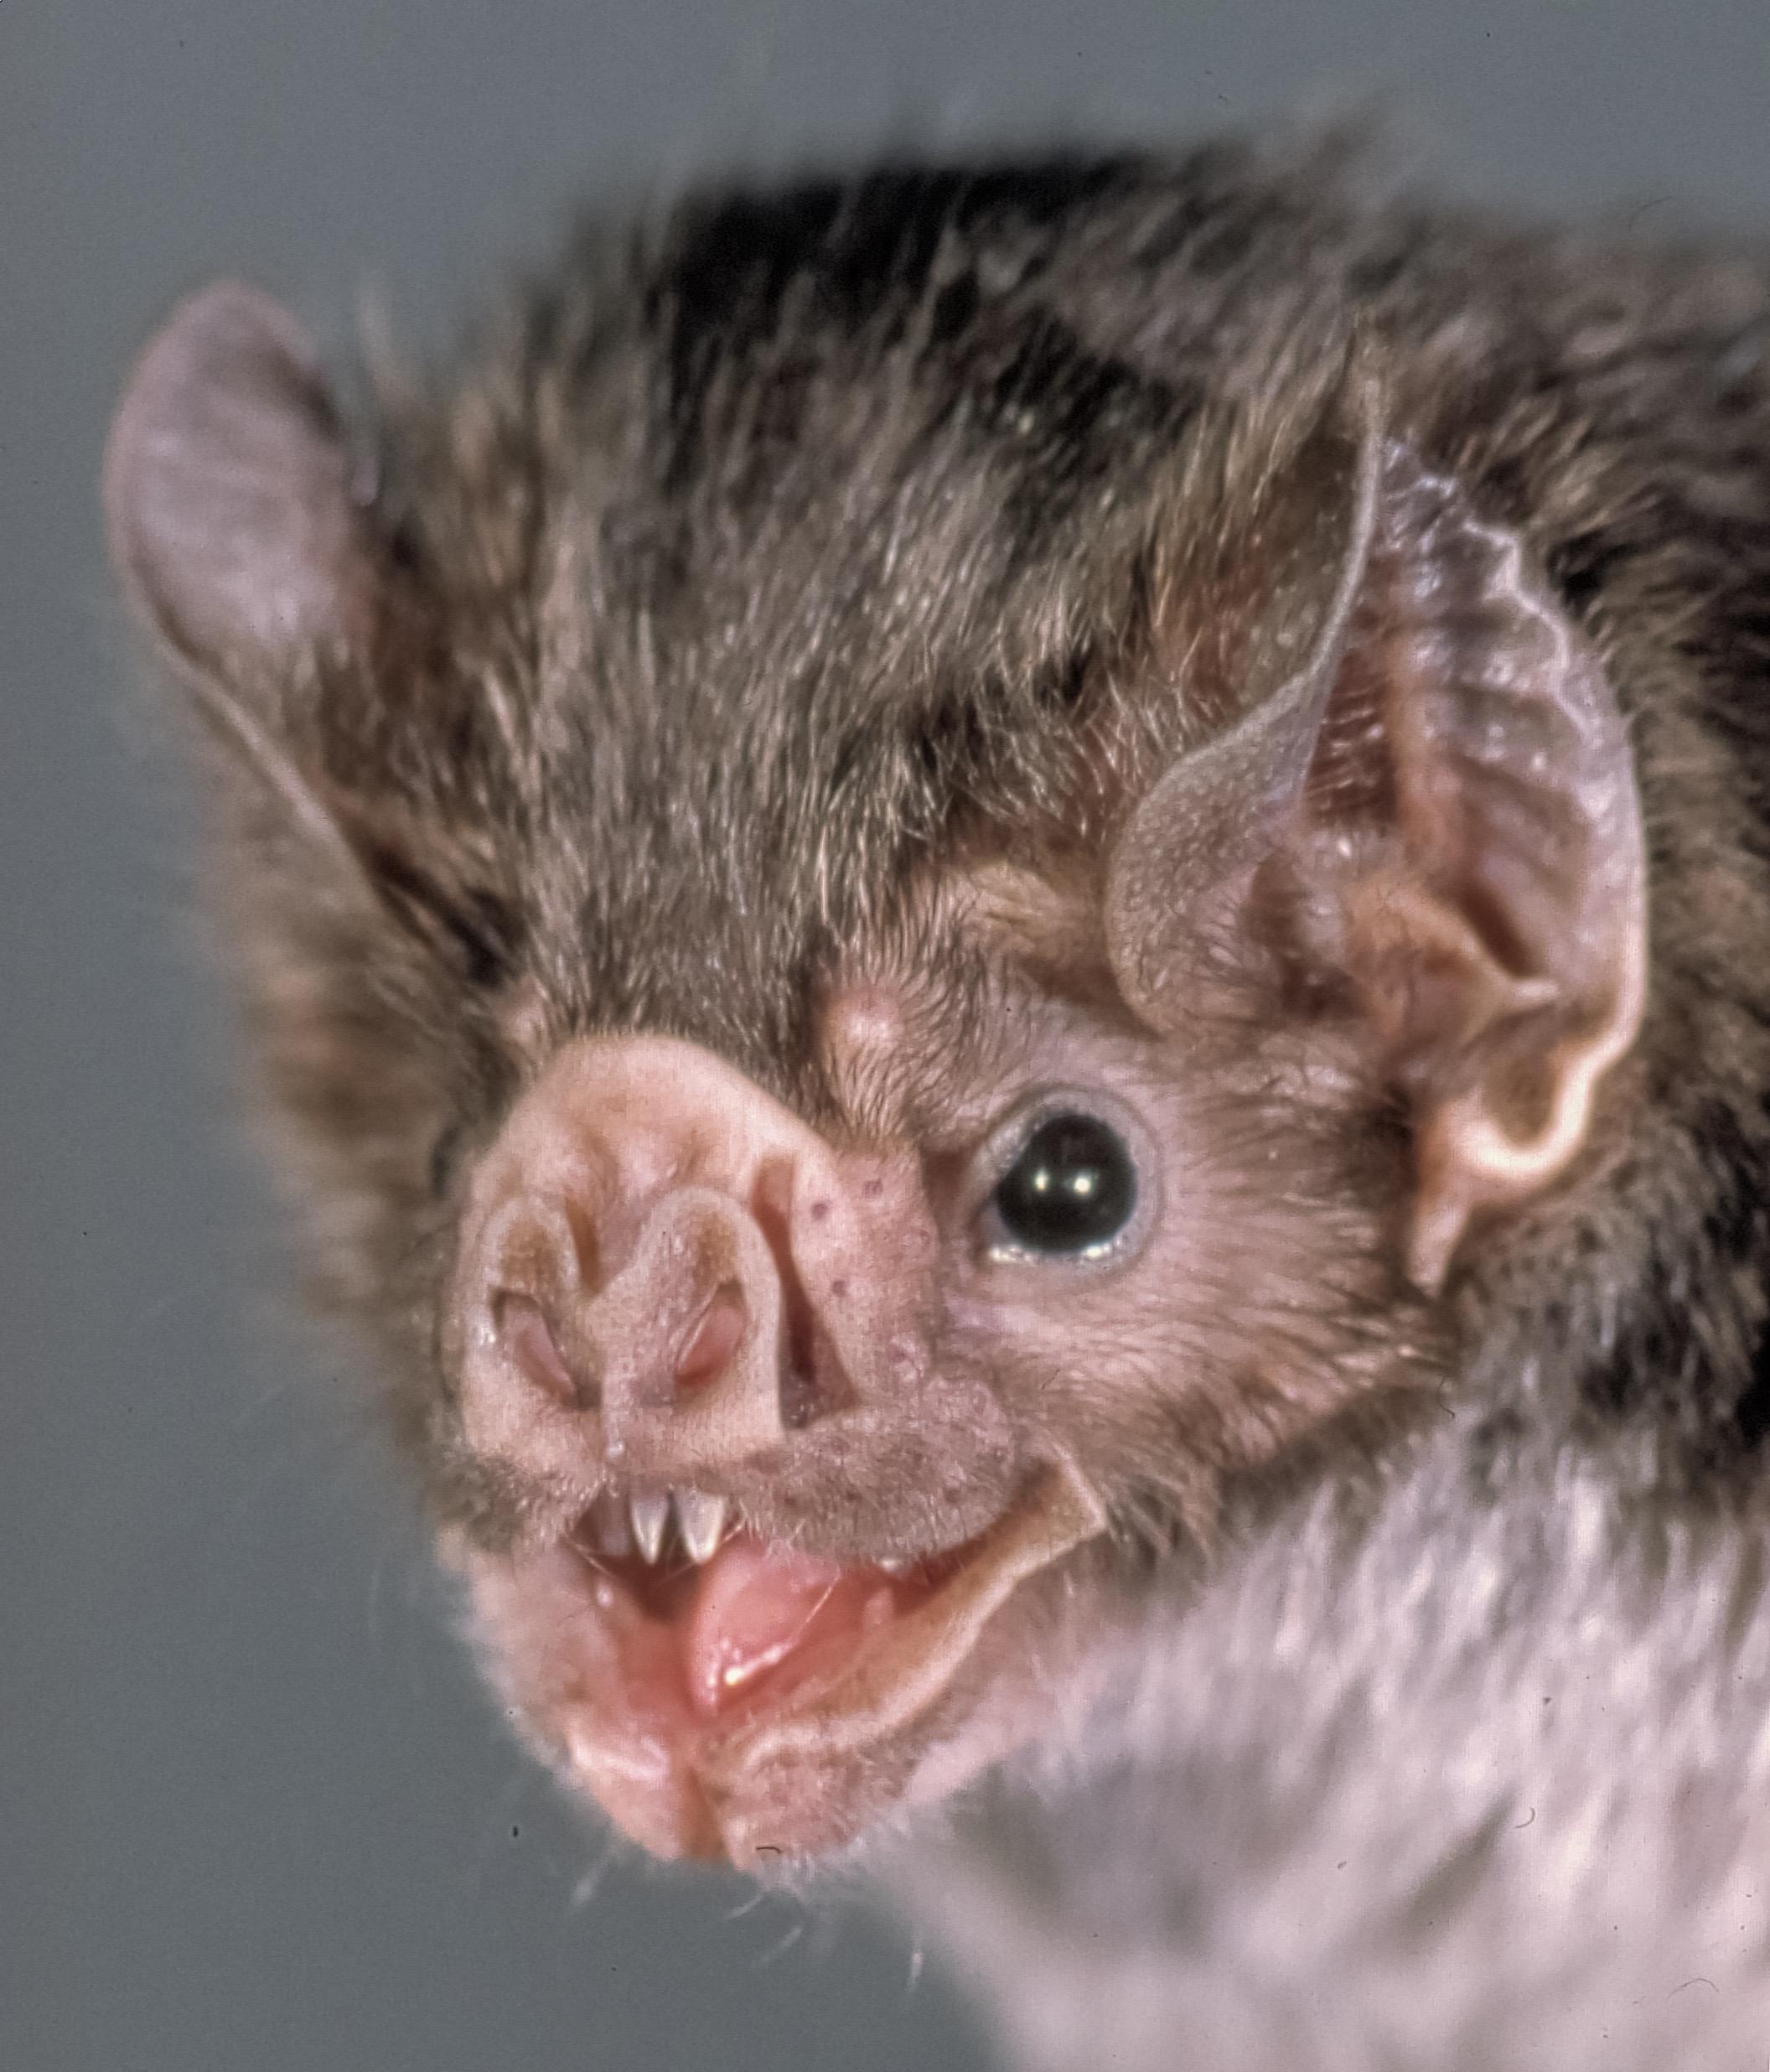 Bat closeup photo